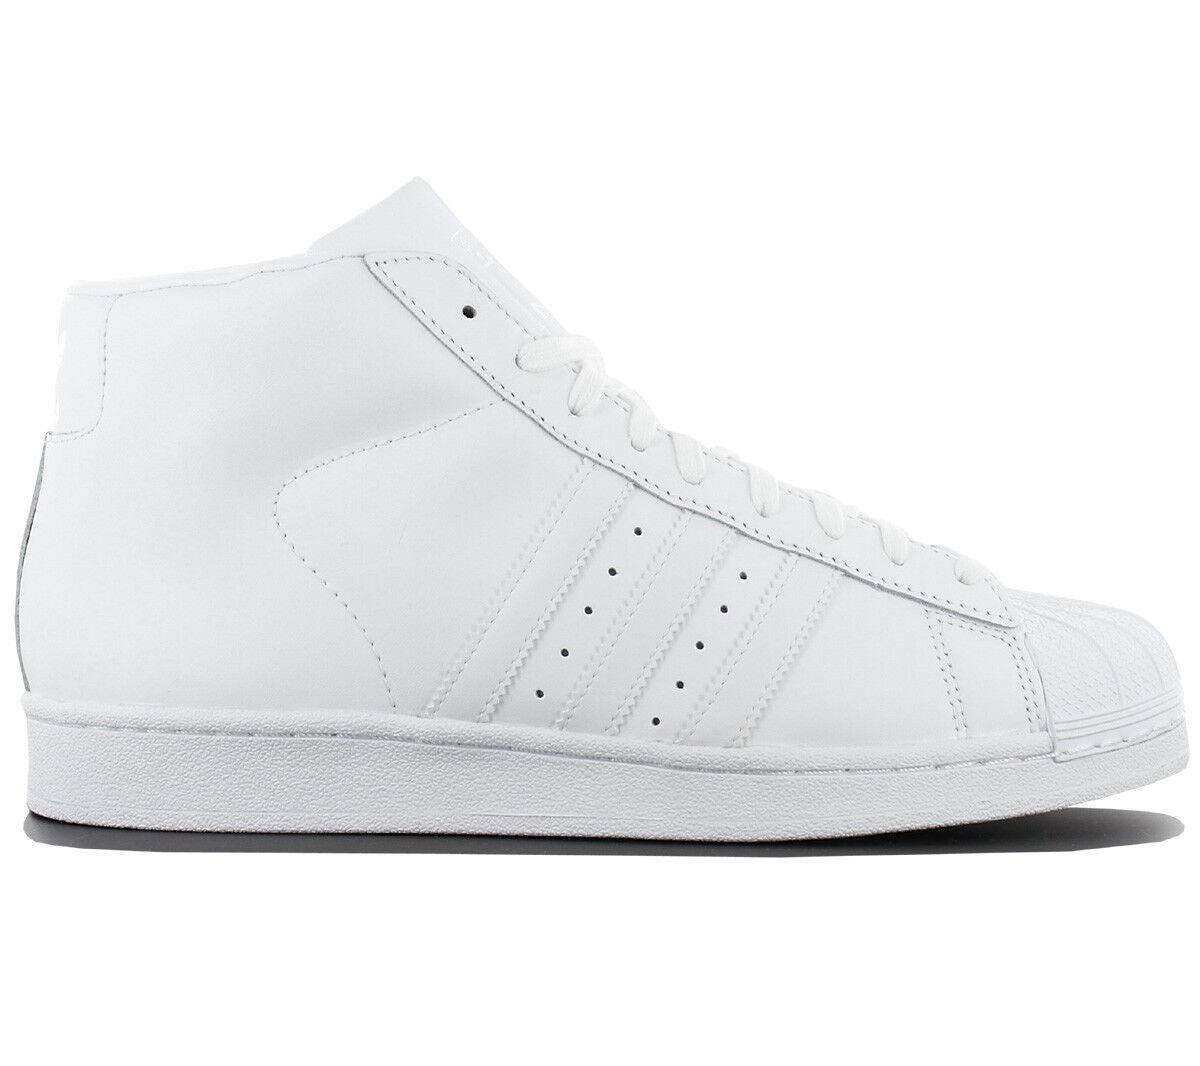 Adidas Superstar pro Model Uomo Trainers Pelle White mid Shoe  AQ5217